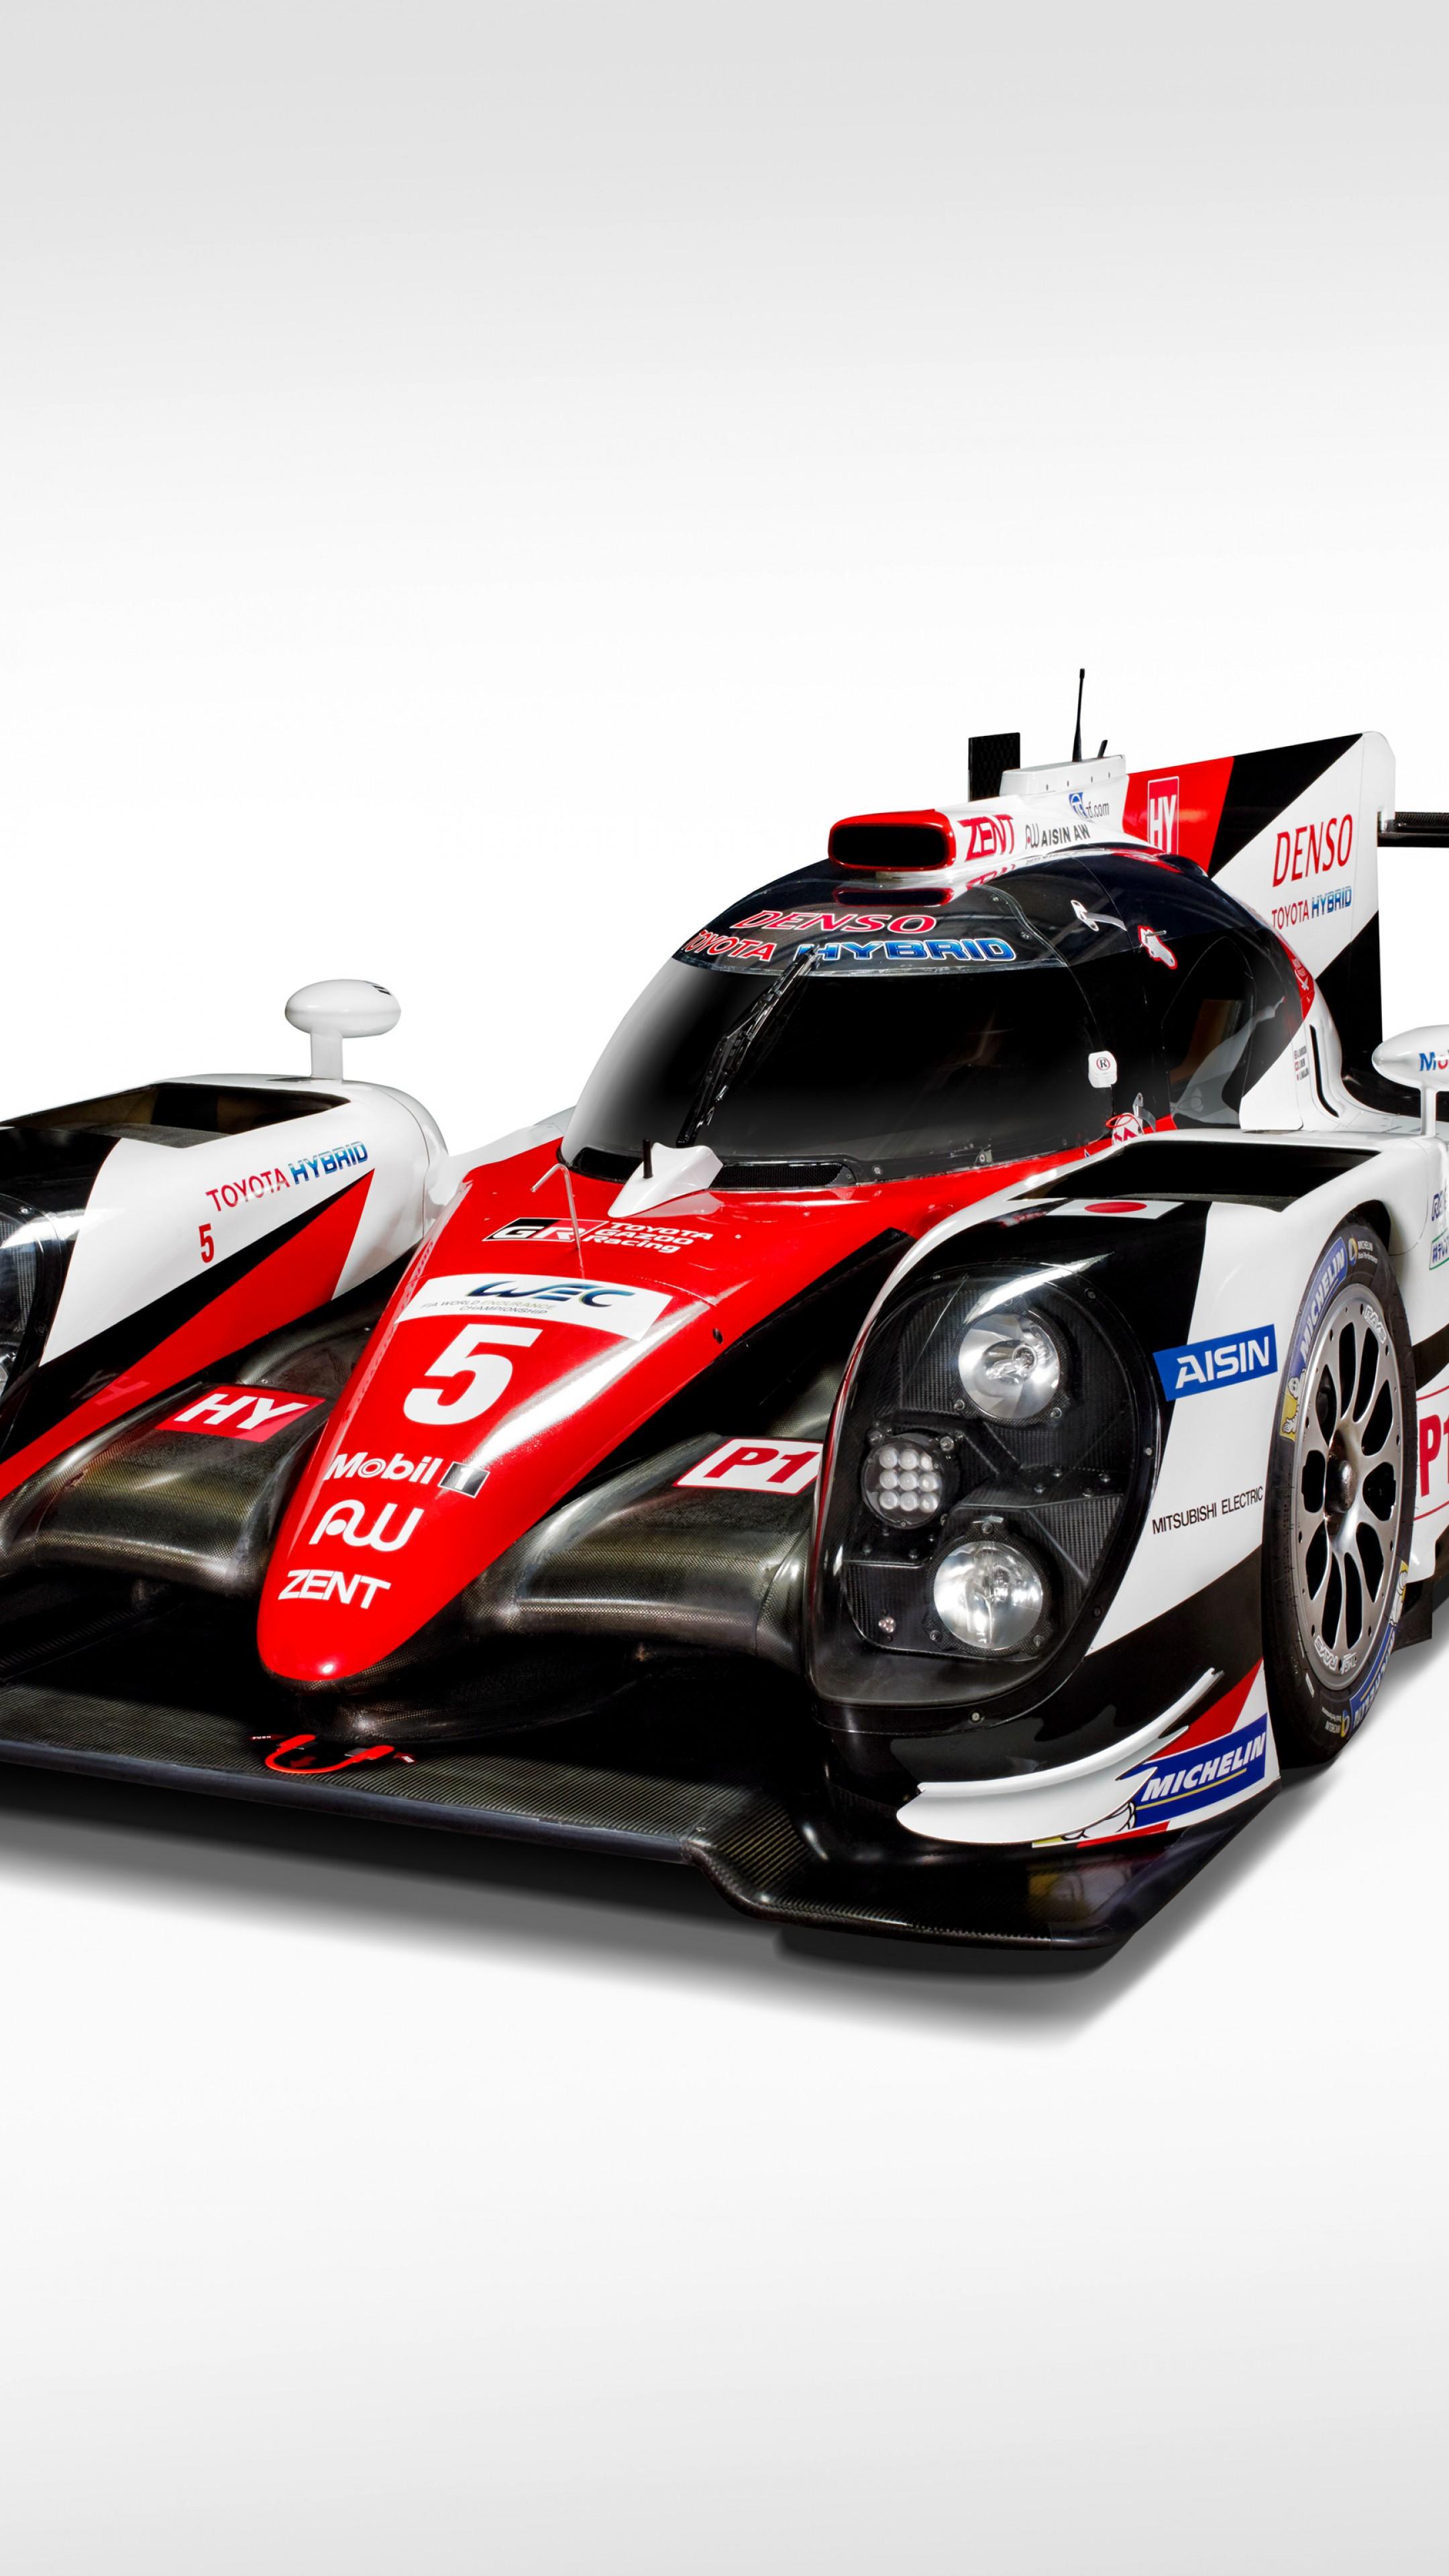 Plug In Hybrid Cars >> Wallpaper Toyota TS050 Hybrid, hybrid, Toyota Gazoo Racing, WEC, Le Mans, Cars & Bikes #9948